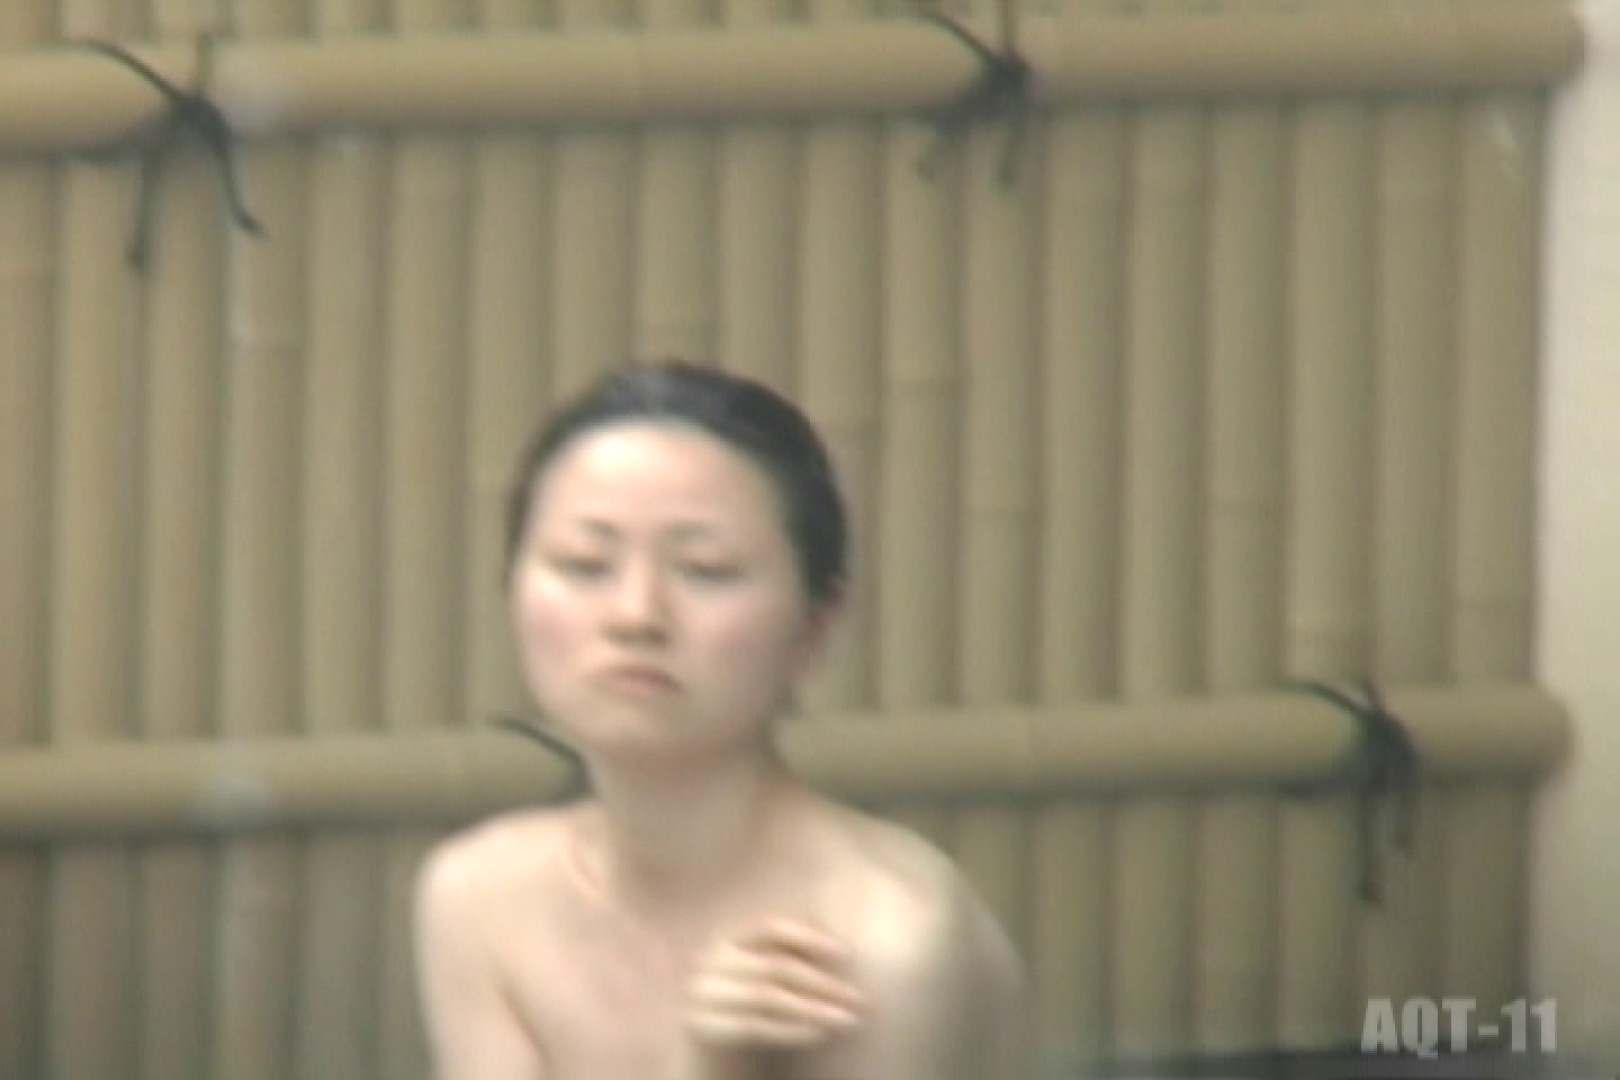 Aquaな露天風呂Vol.802 女体盗撮 盗み撮りSEX無修正画像 85連発 80